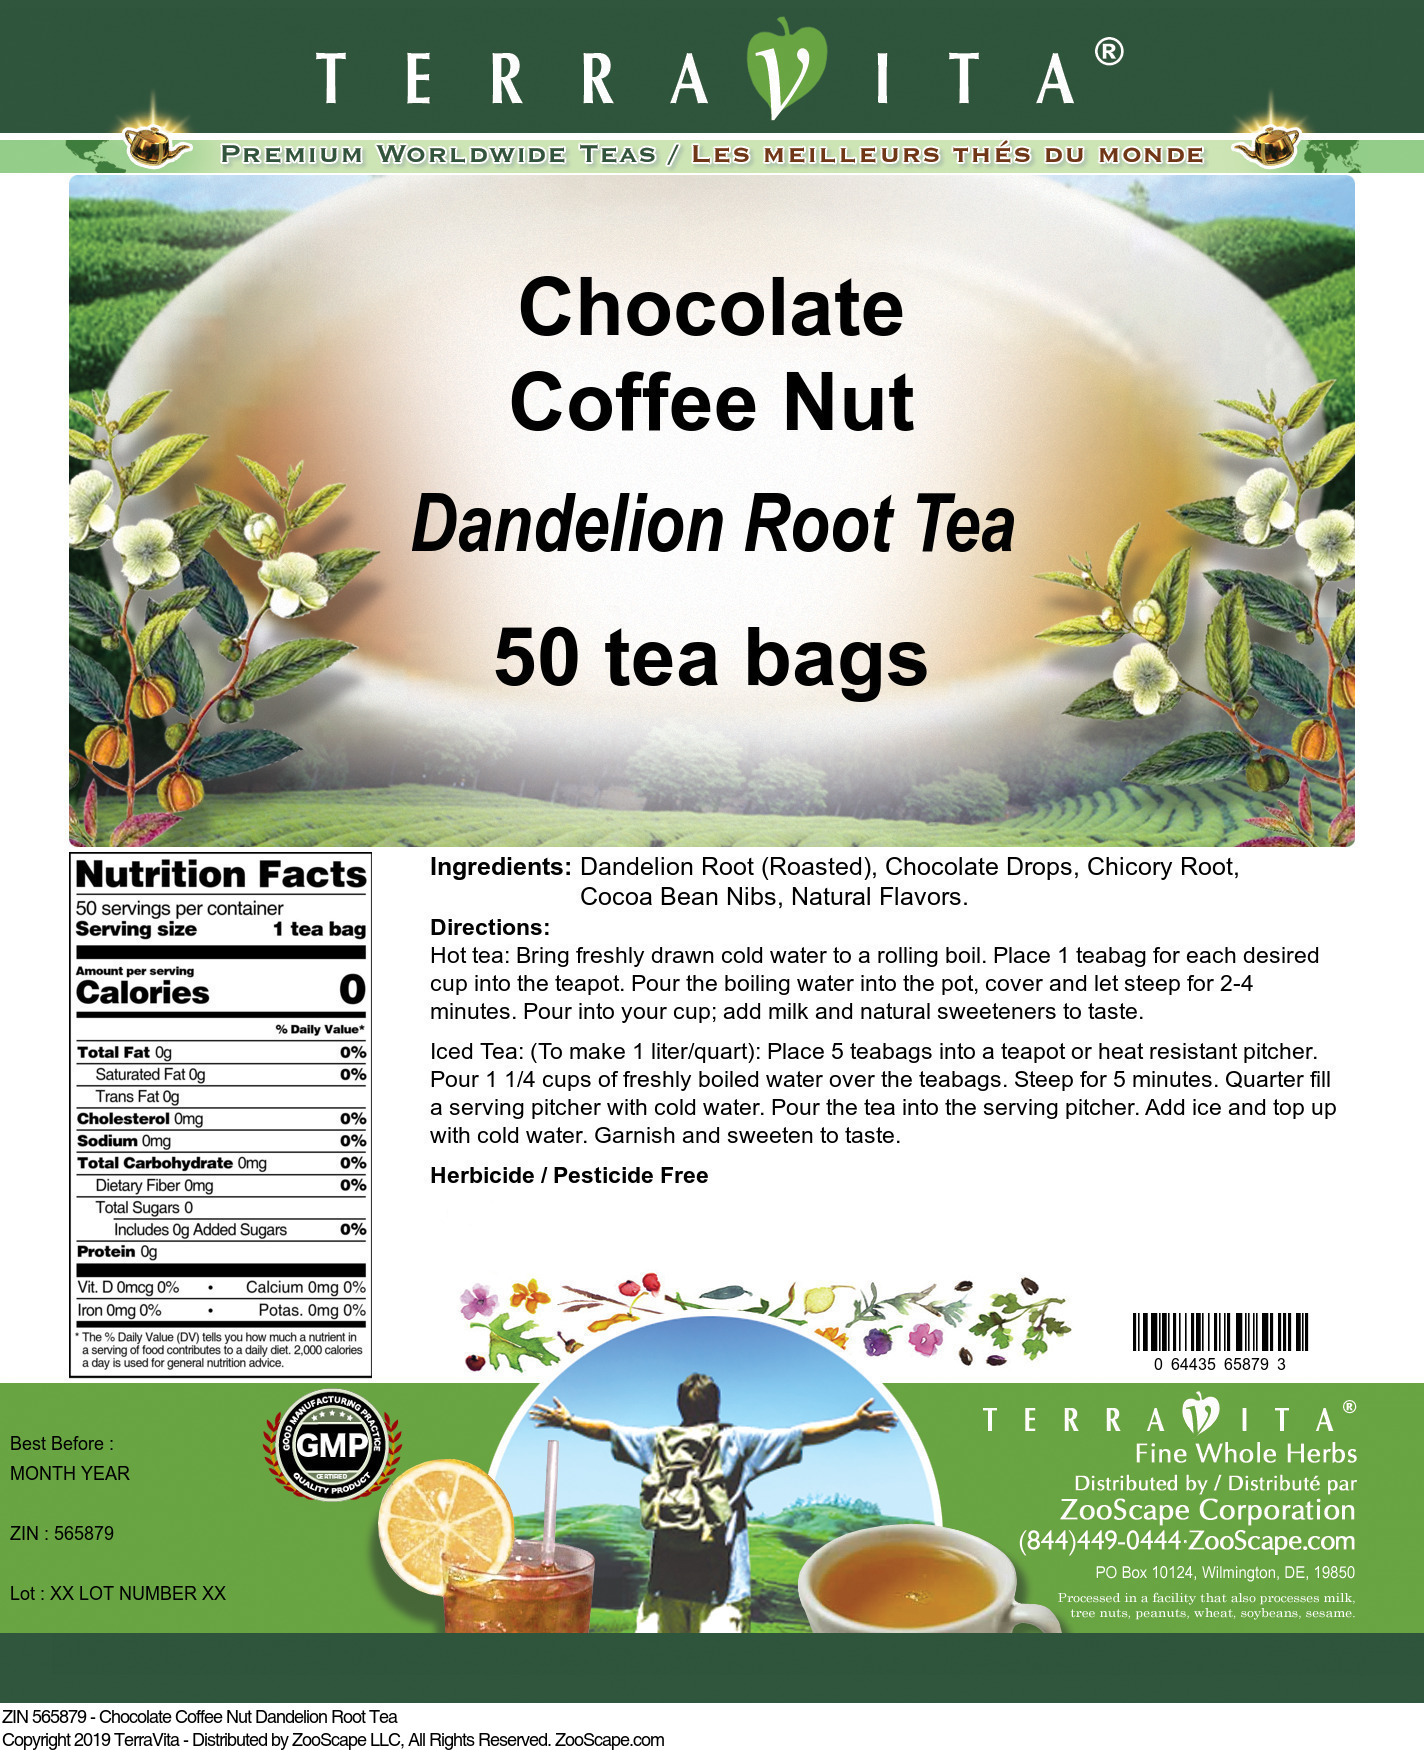 Chocolate Coffee Nut Dandelion Root